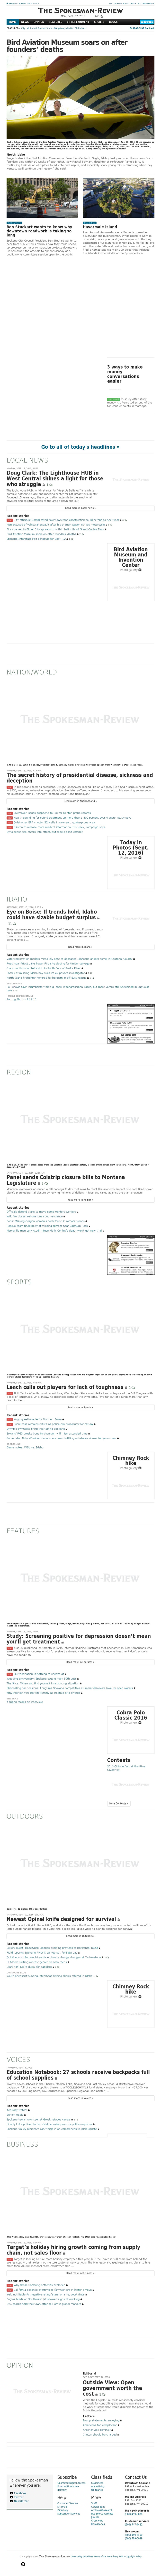 The (Spokane) Spokesman-Review at Tuesday Sept. 13, 2016, 2:22 a.m. UTC